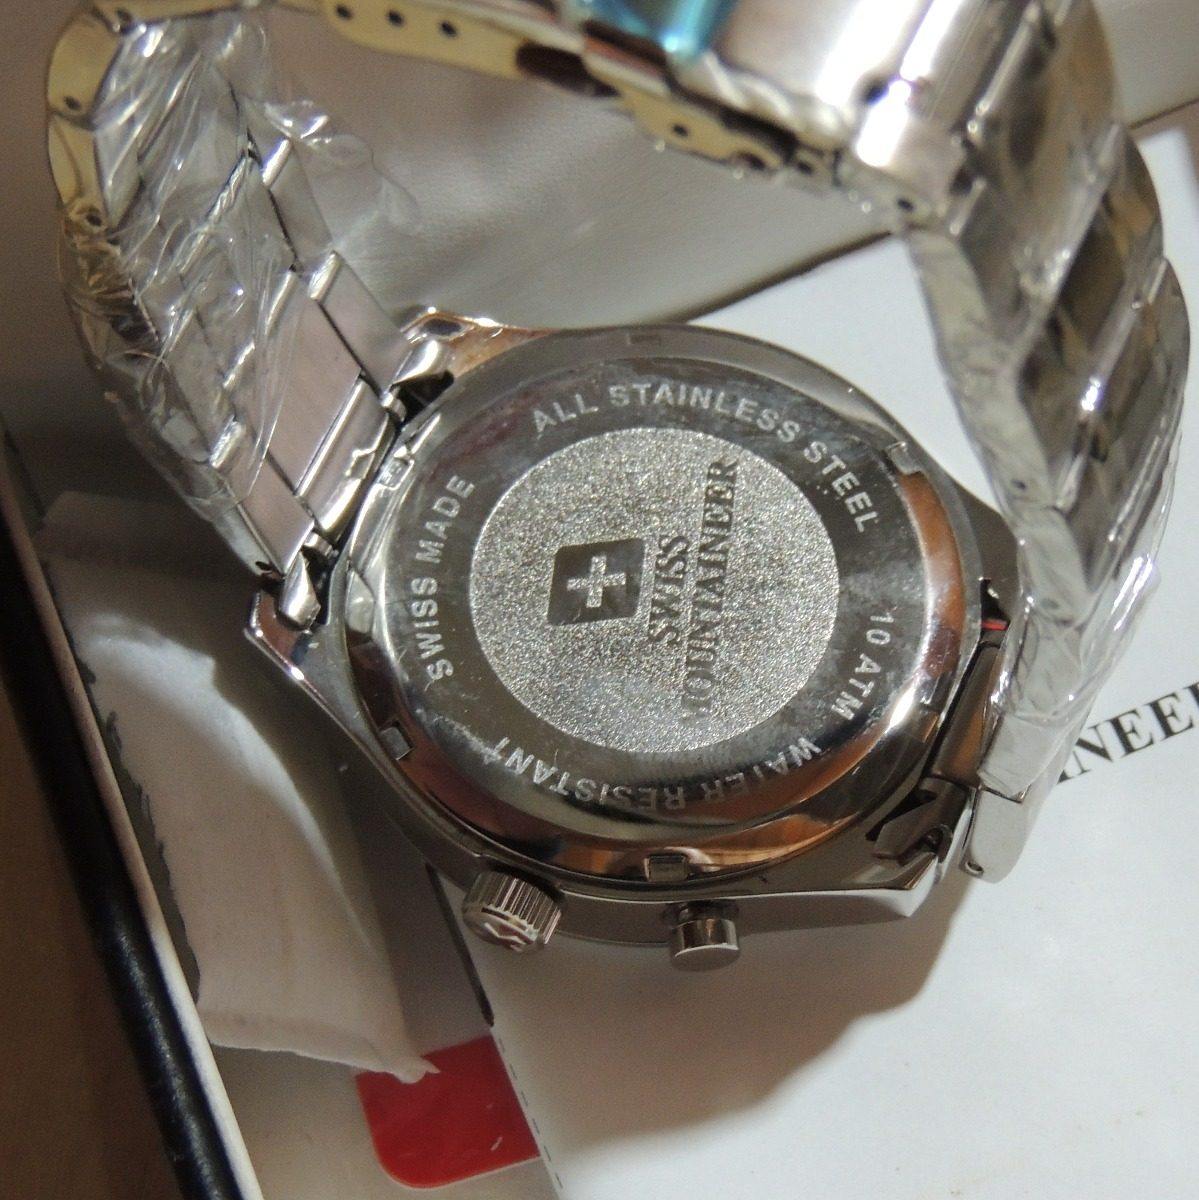 7501c8fd6 relogio suiço watch swiss mountaineer sm1220 steel aço. Carregando zoom.